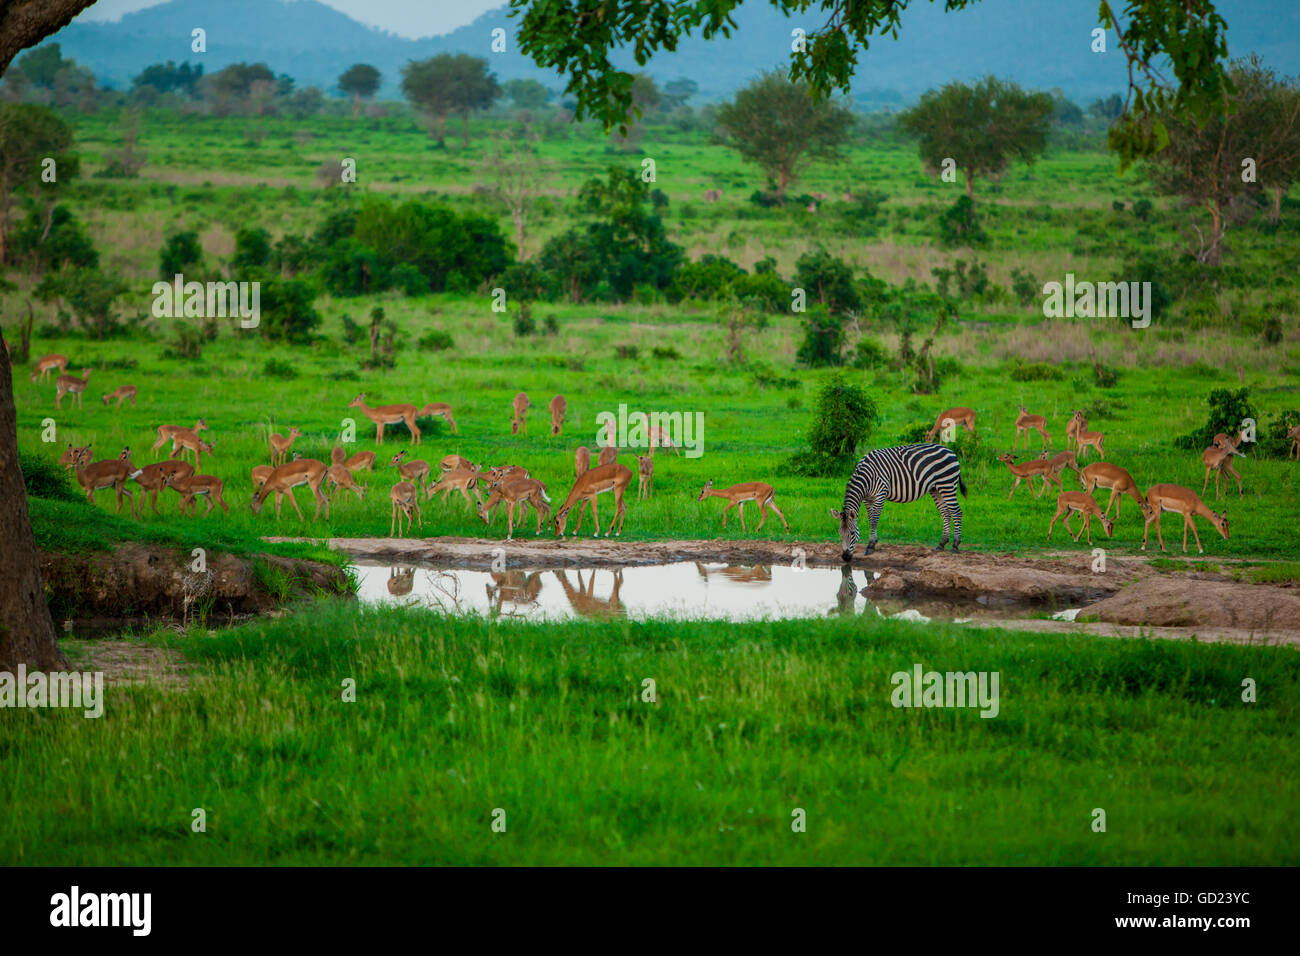 Zebra and wildlife at the watering hole, Mizumi Safari Park, Tanzania, East Africa, Africa - Stock Image